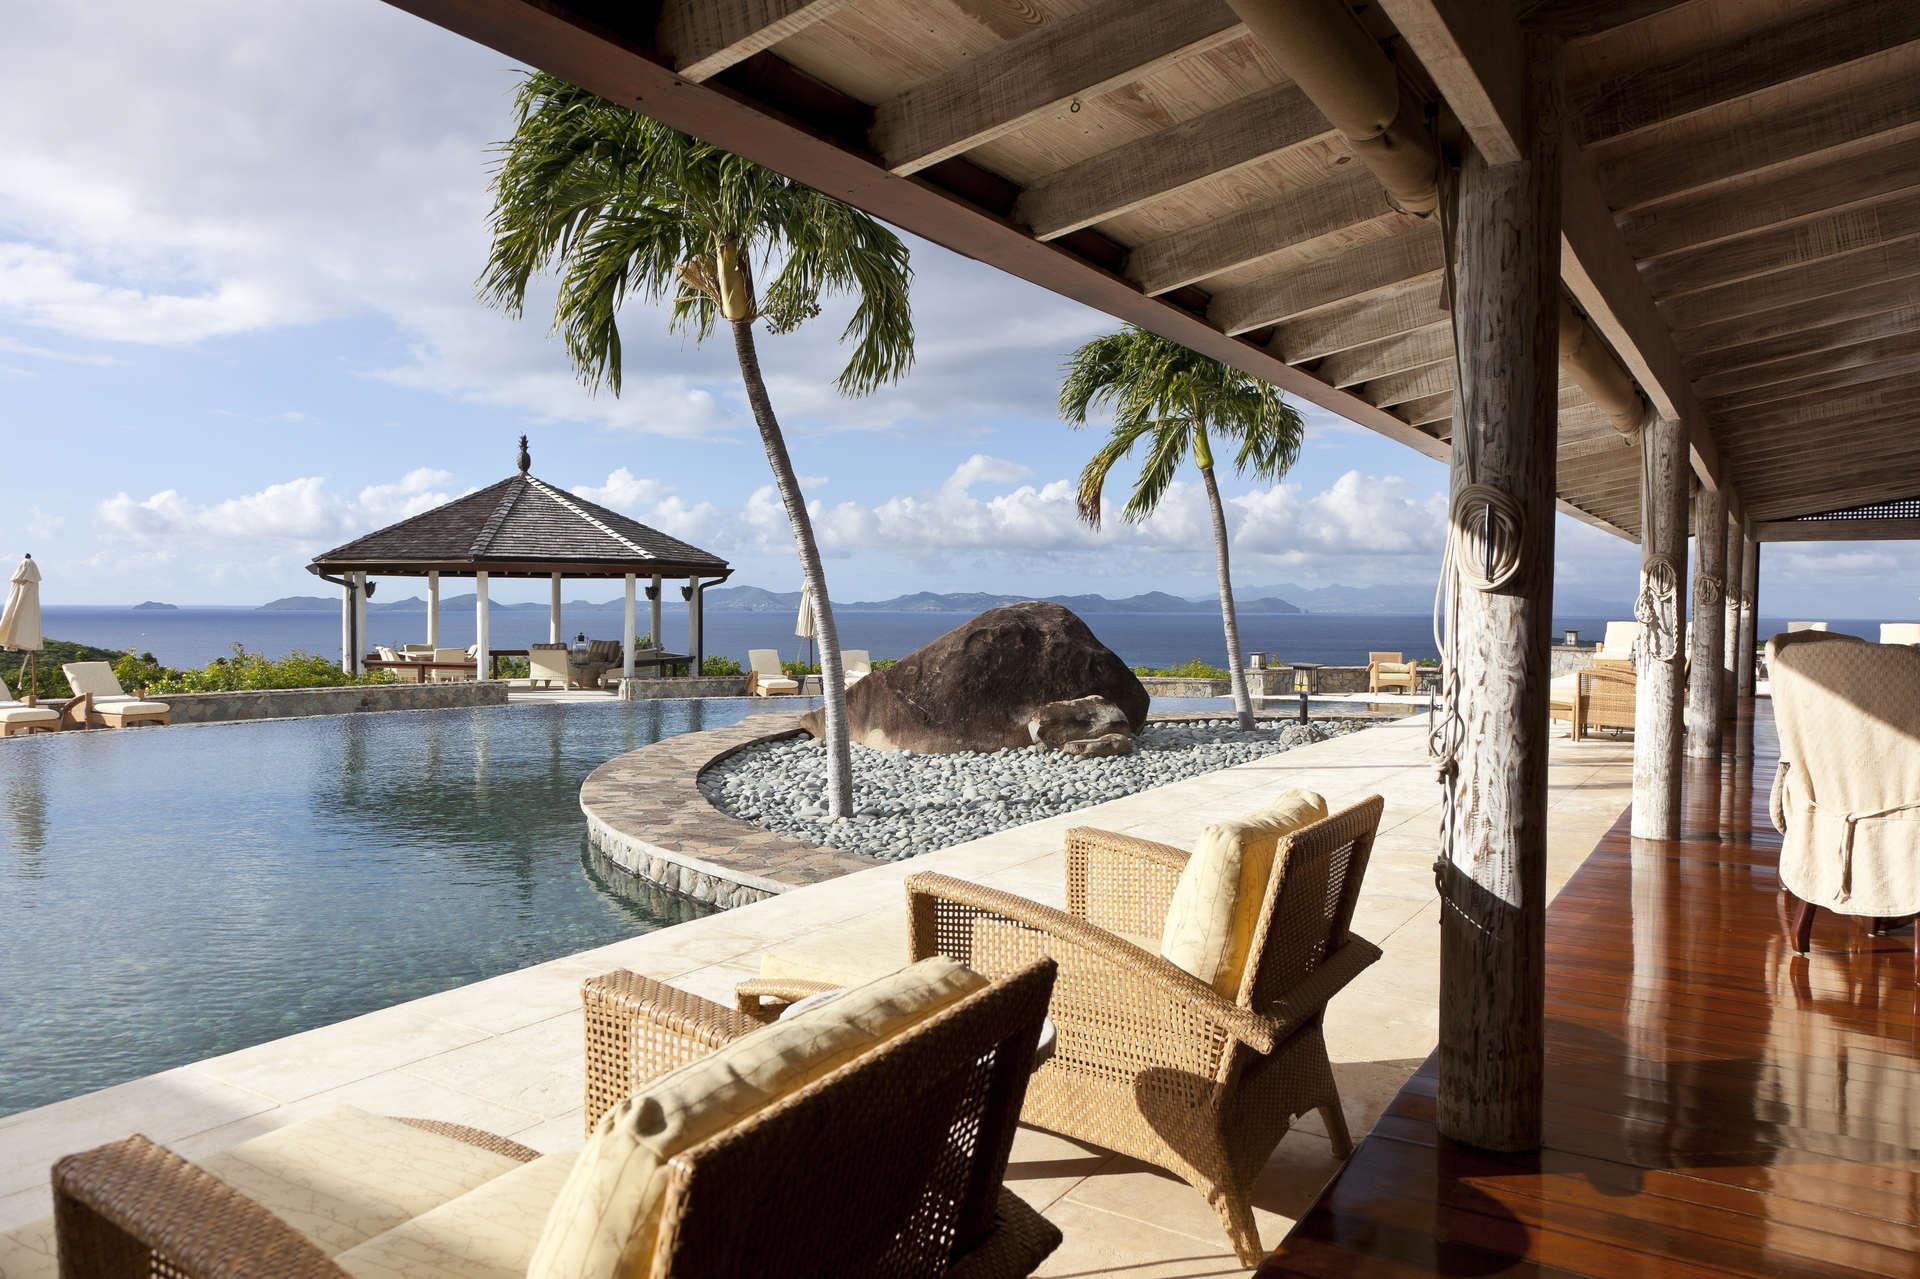 Luxury villa rentals caribbean - St vincent and the grenadines - St vincent - Mustique - Blackstone - Image 1/28